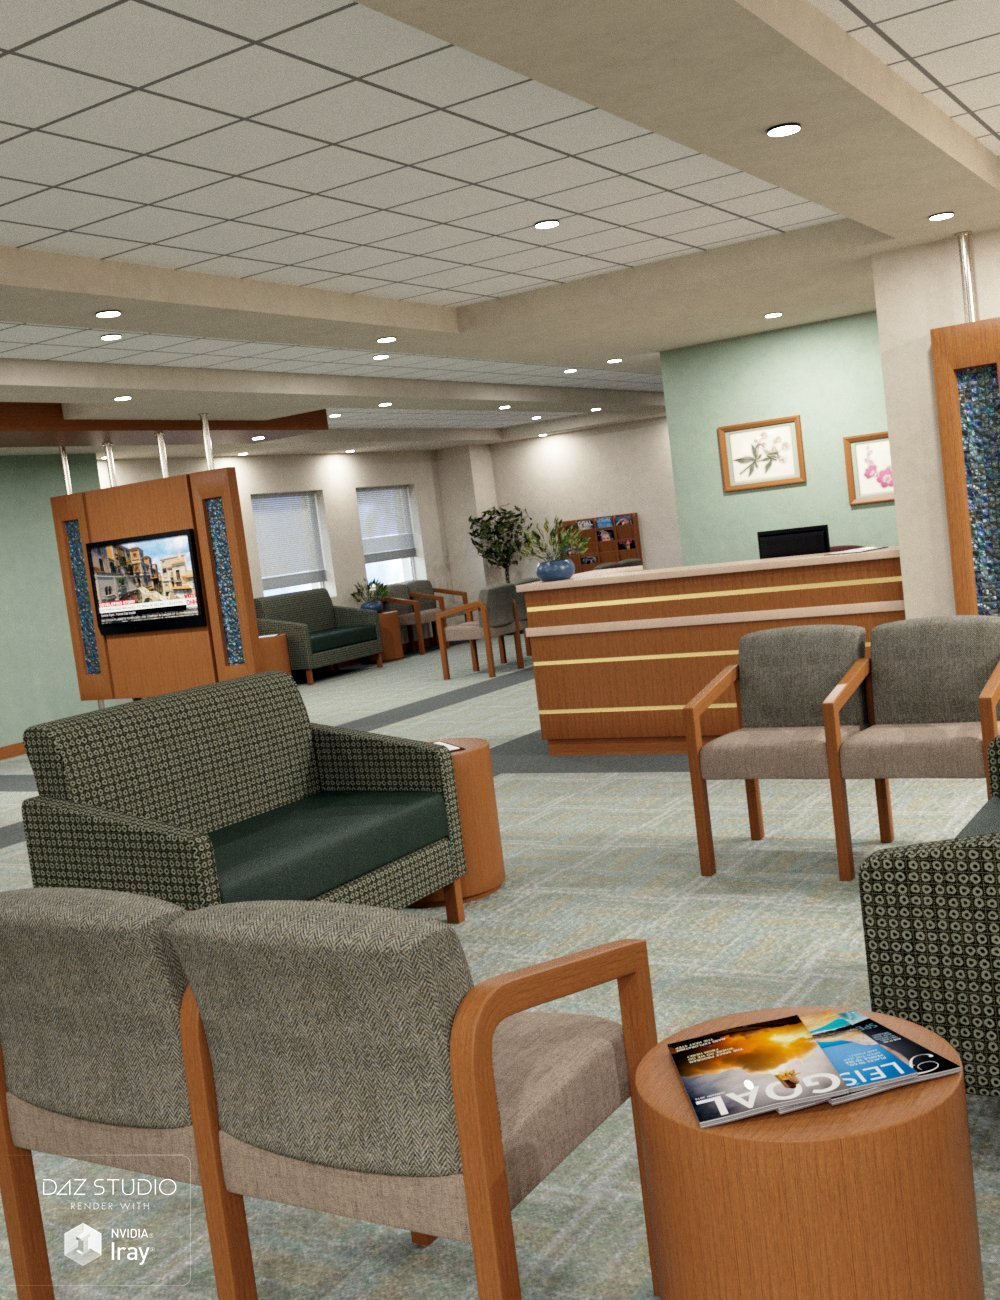 Medical Center Waiting Room by: SloshWerks, 3D Models by Daz 3D